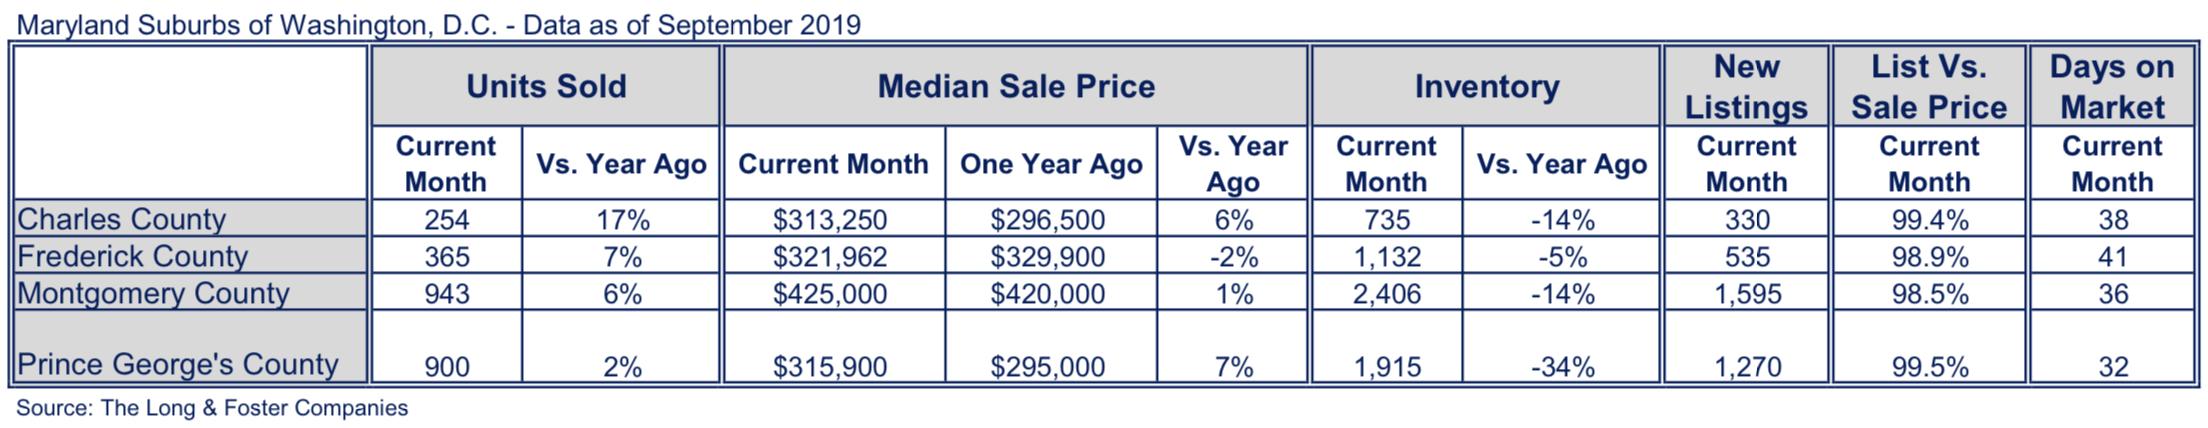 Maryland Suburbs Market Minute Chart September 2019